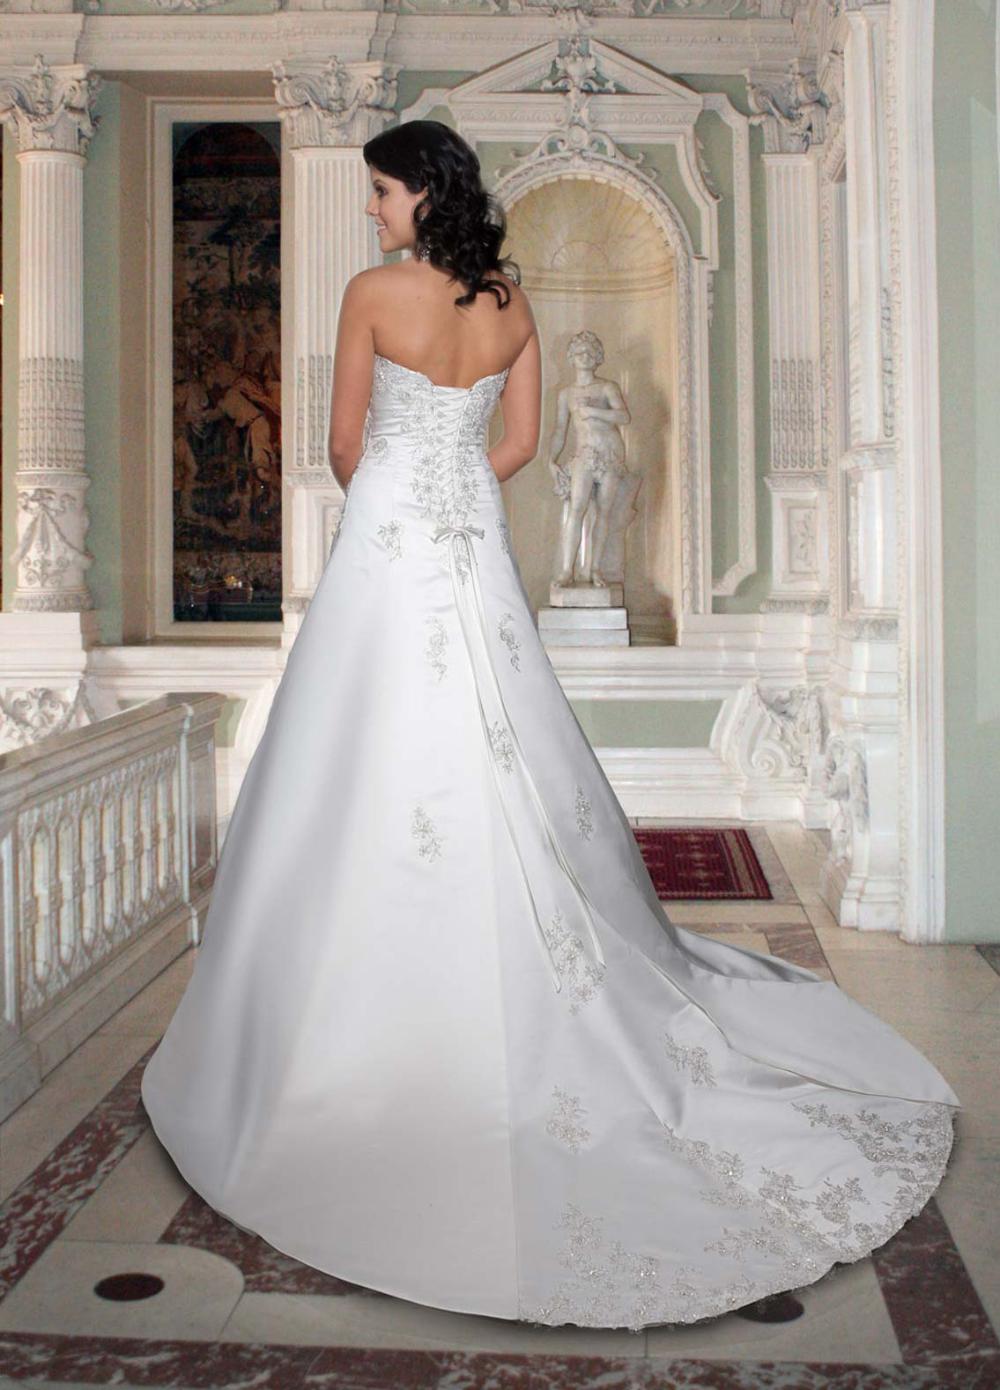 Style 8354 Davinci Wedding Dresses In 2020 Wedding Dresses Glasgow Wedding Dresses Davinci Wedding Dresses